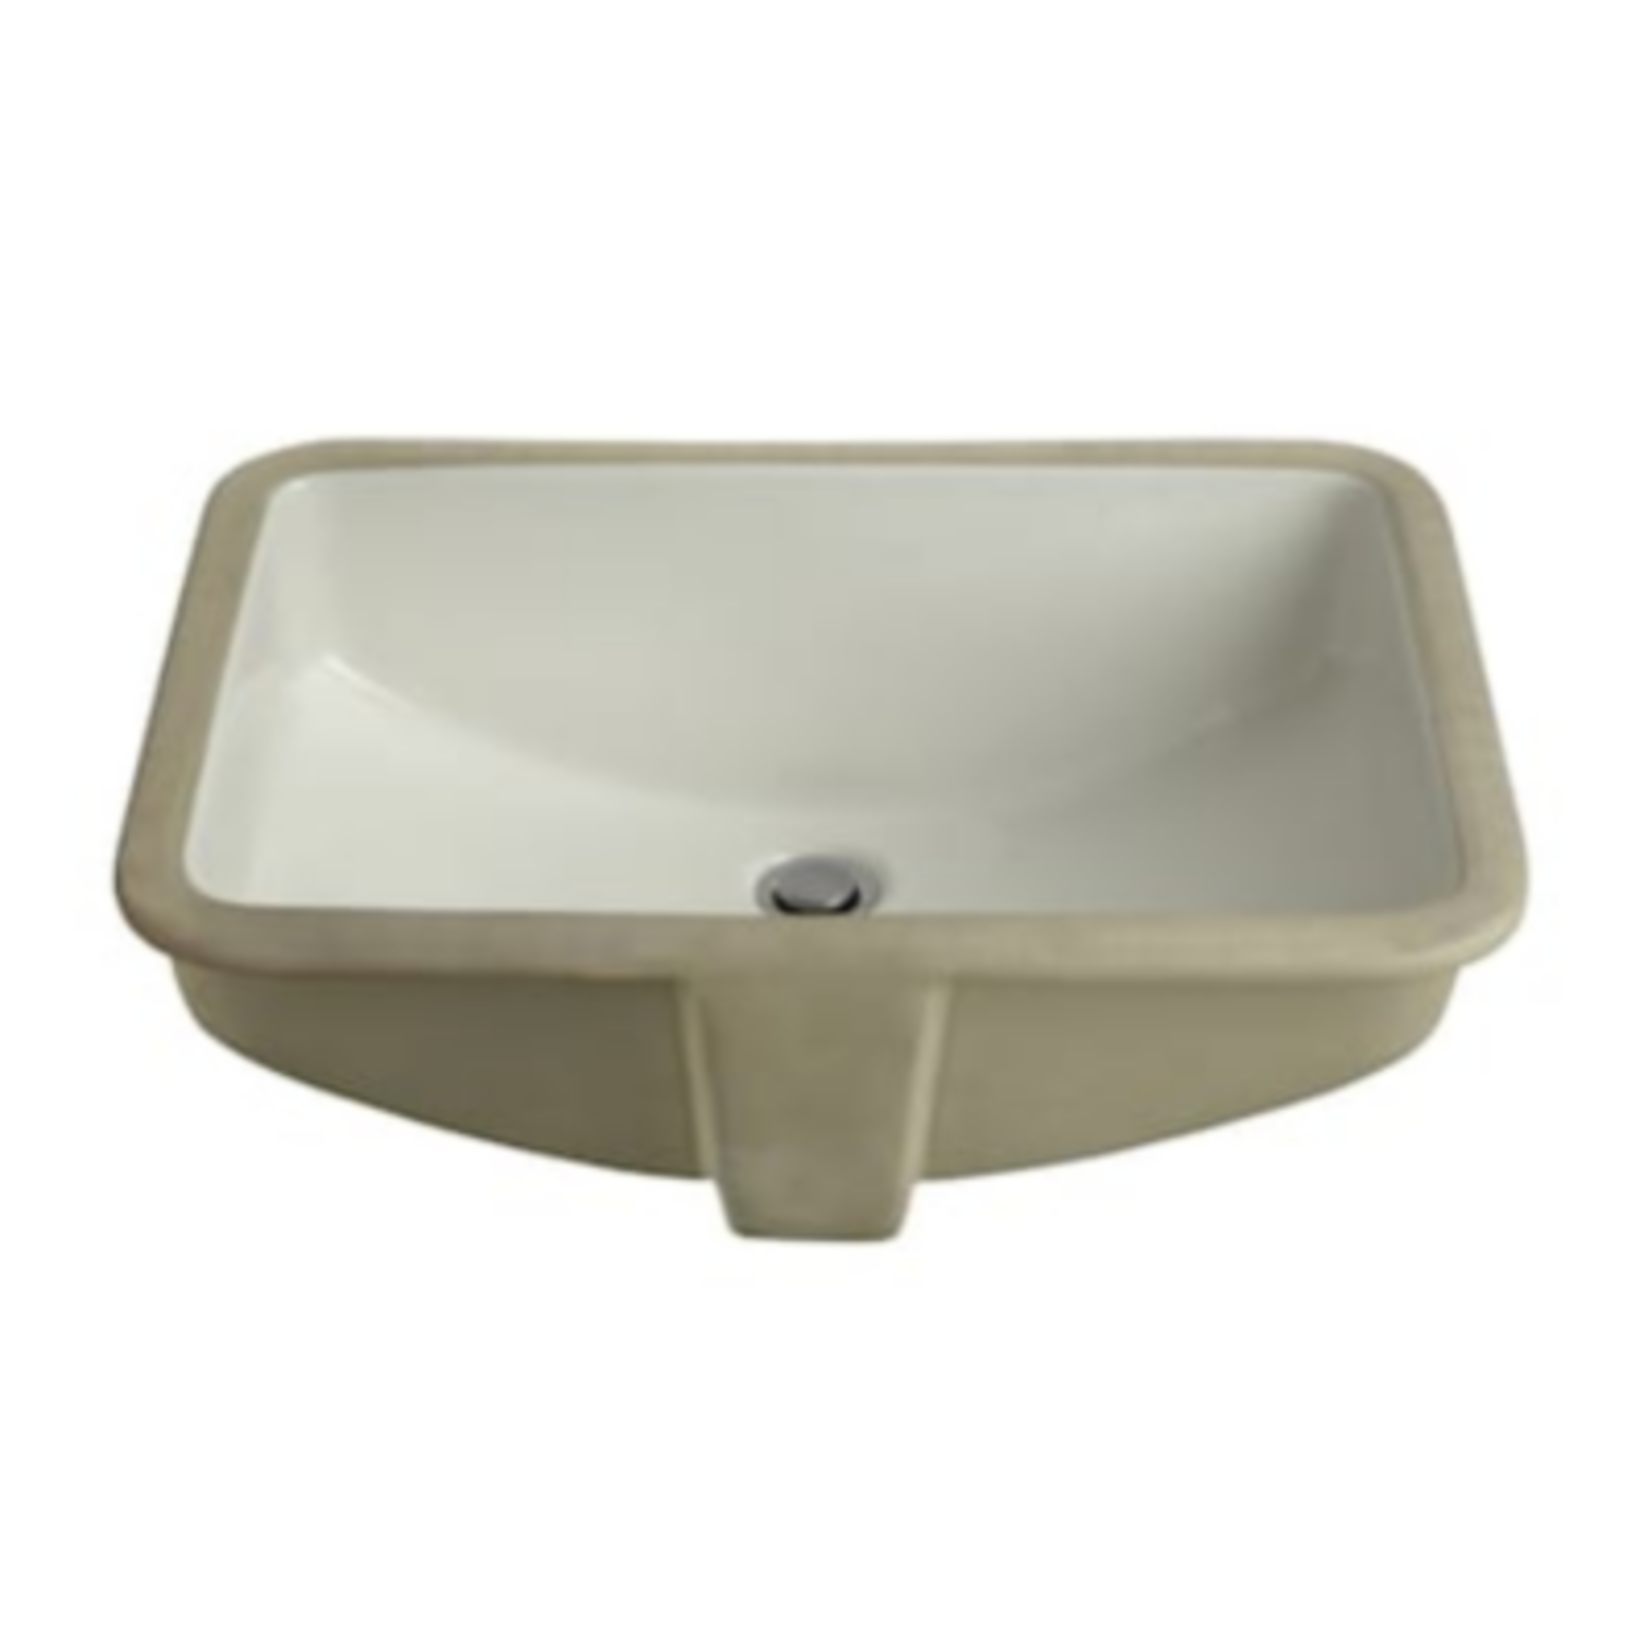 2724 AquaSource Undermount Rectangular Bathroom Sink